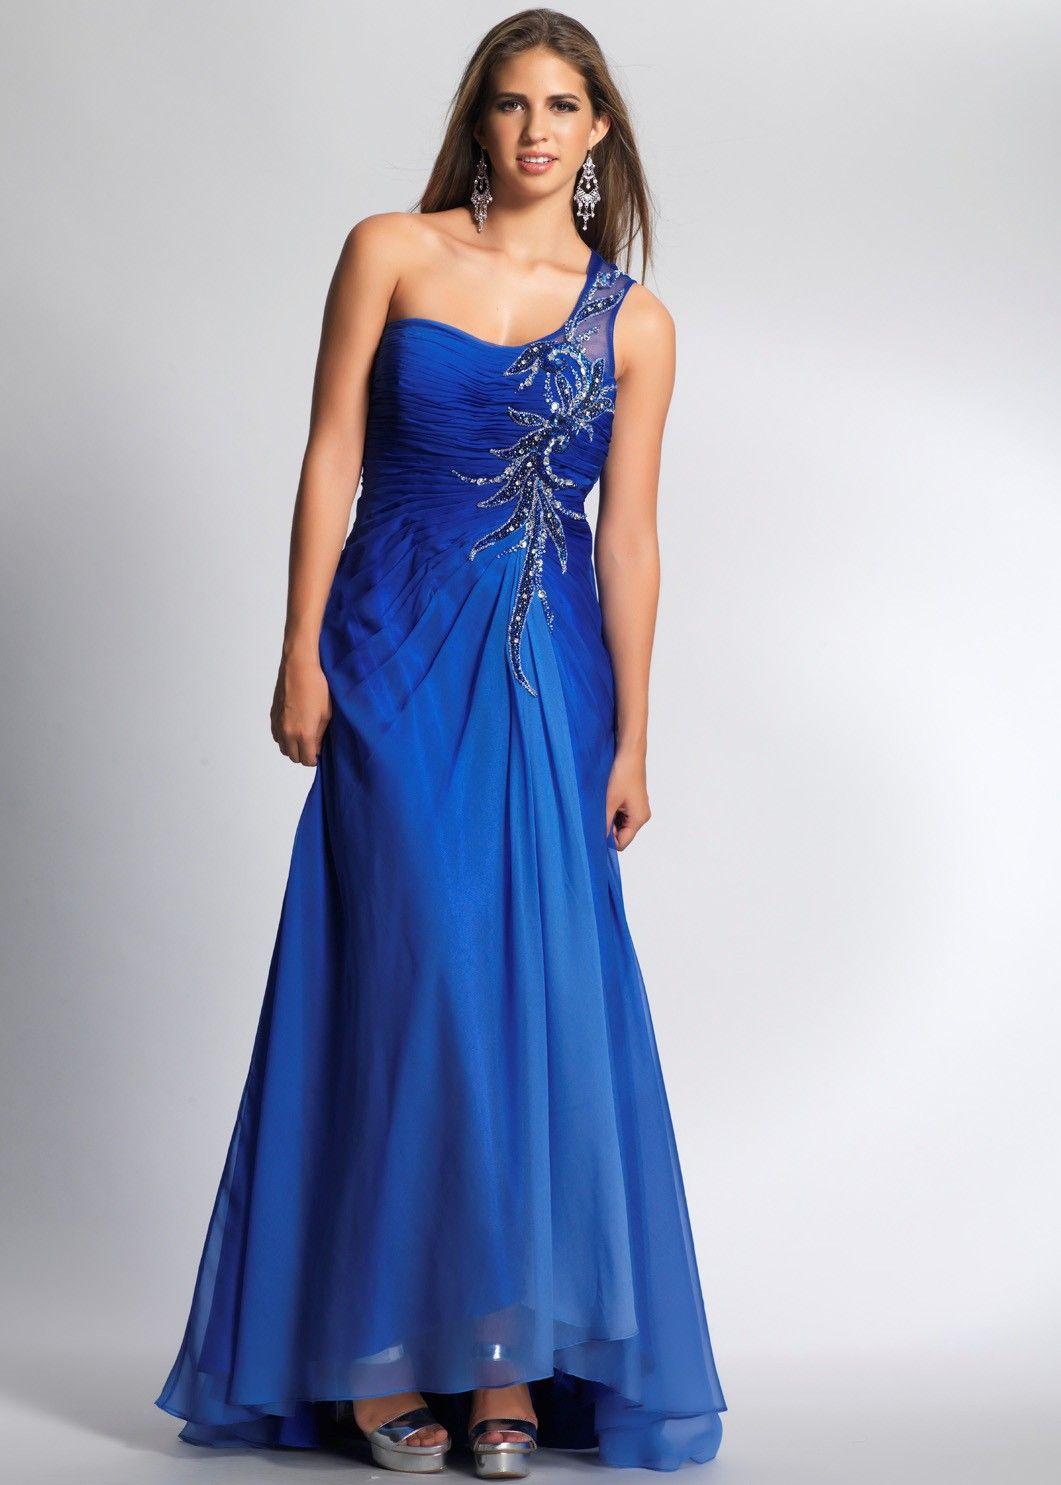 e7307620179 Sapphire blue bridesmaid dresses - Google Search